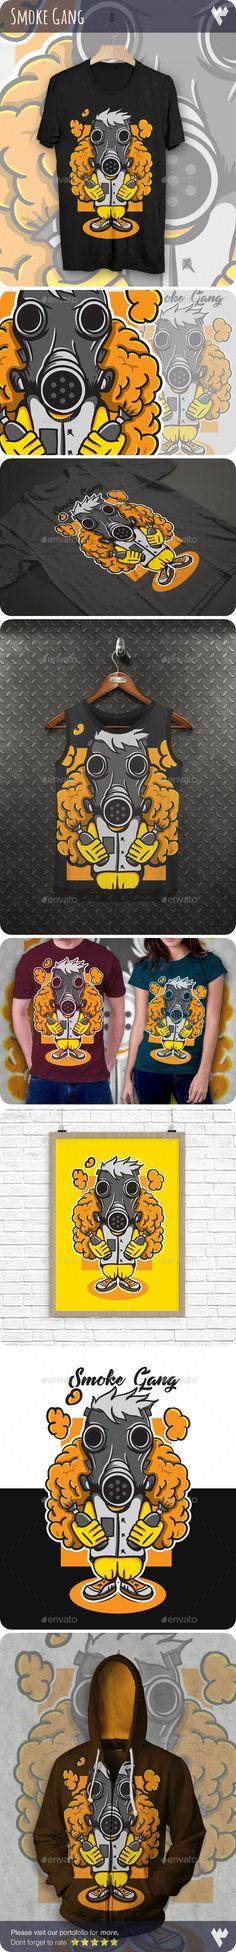 Vape Smoke Gang #T-Shirt Design - Funny Designs Download here:   https://graphicriver.net/item/vape-smoke-gang-tshirt-design/20422325?ref=alena994